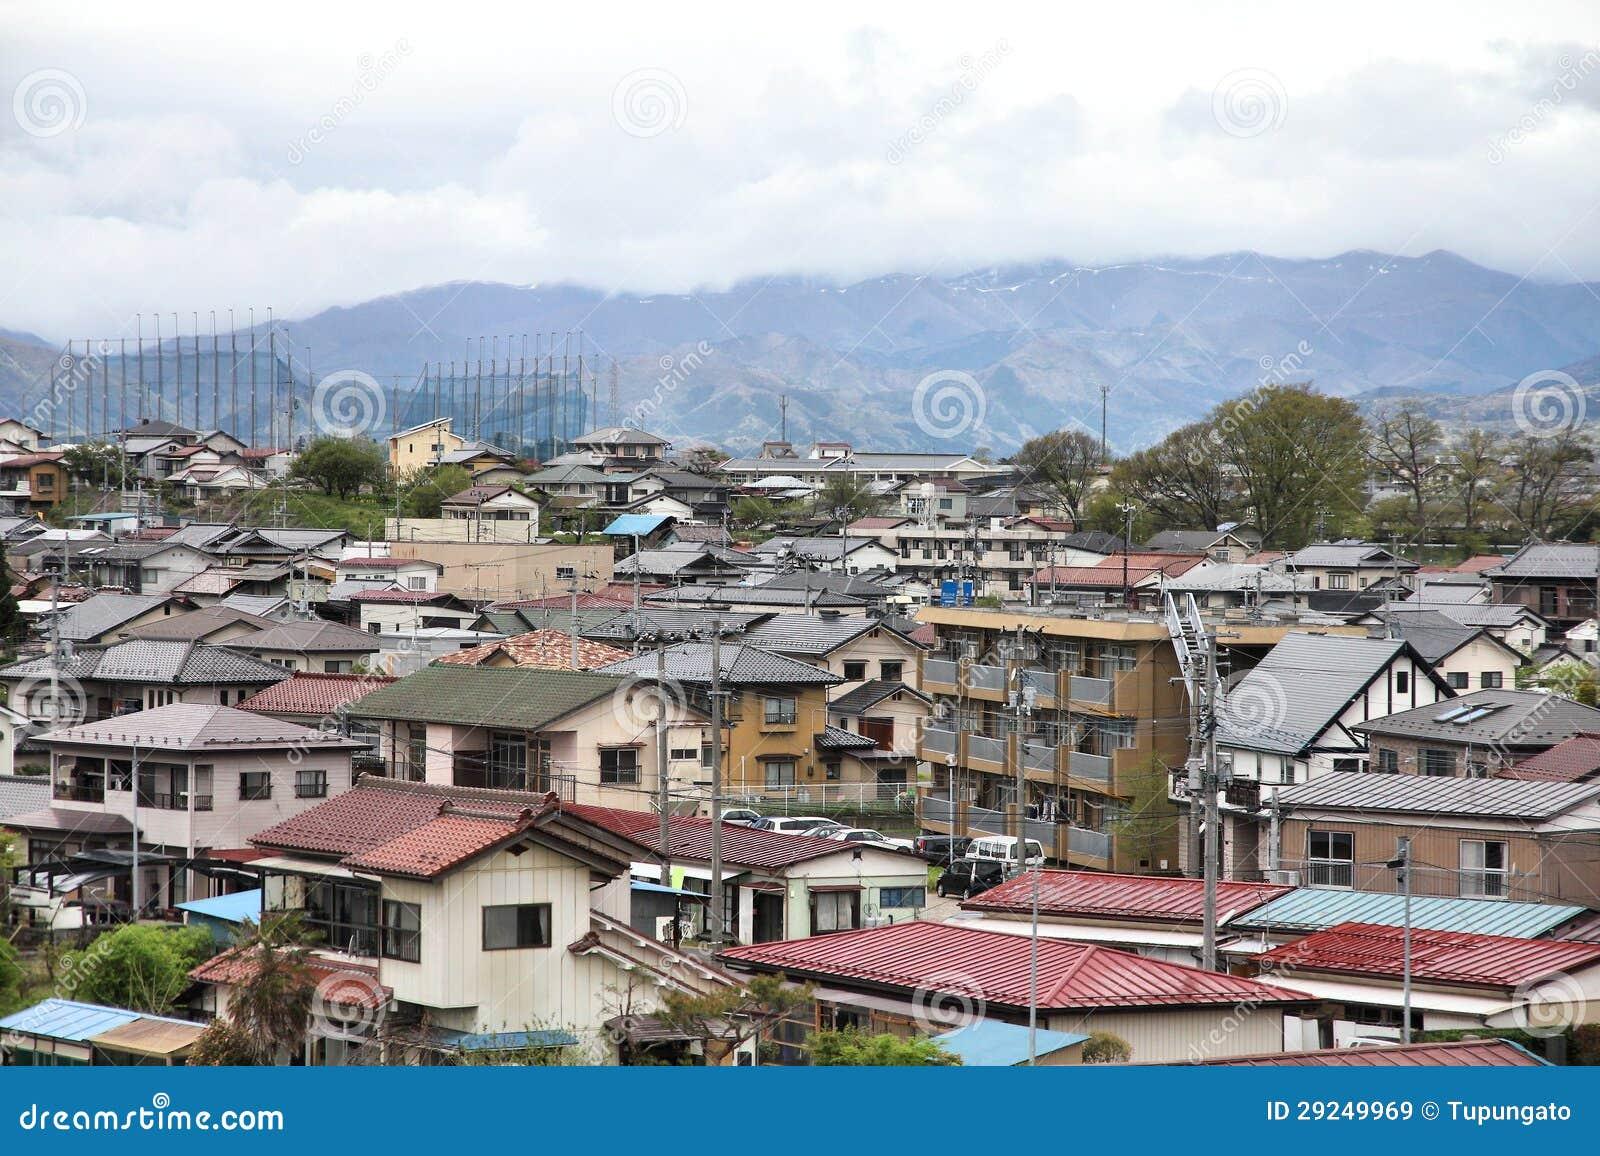 Download Koriyama, Japão imagem de stock. Imagem de cidade, japonês - 29249969